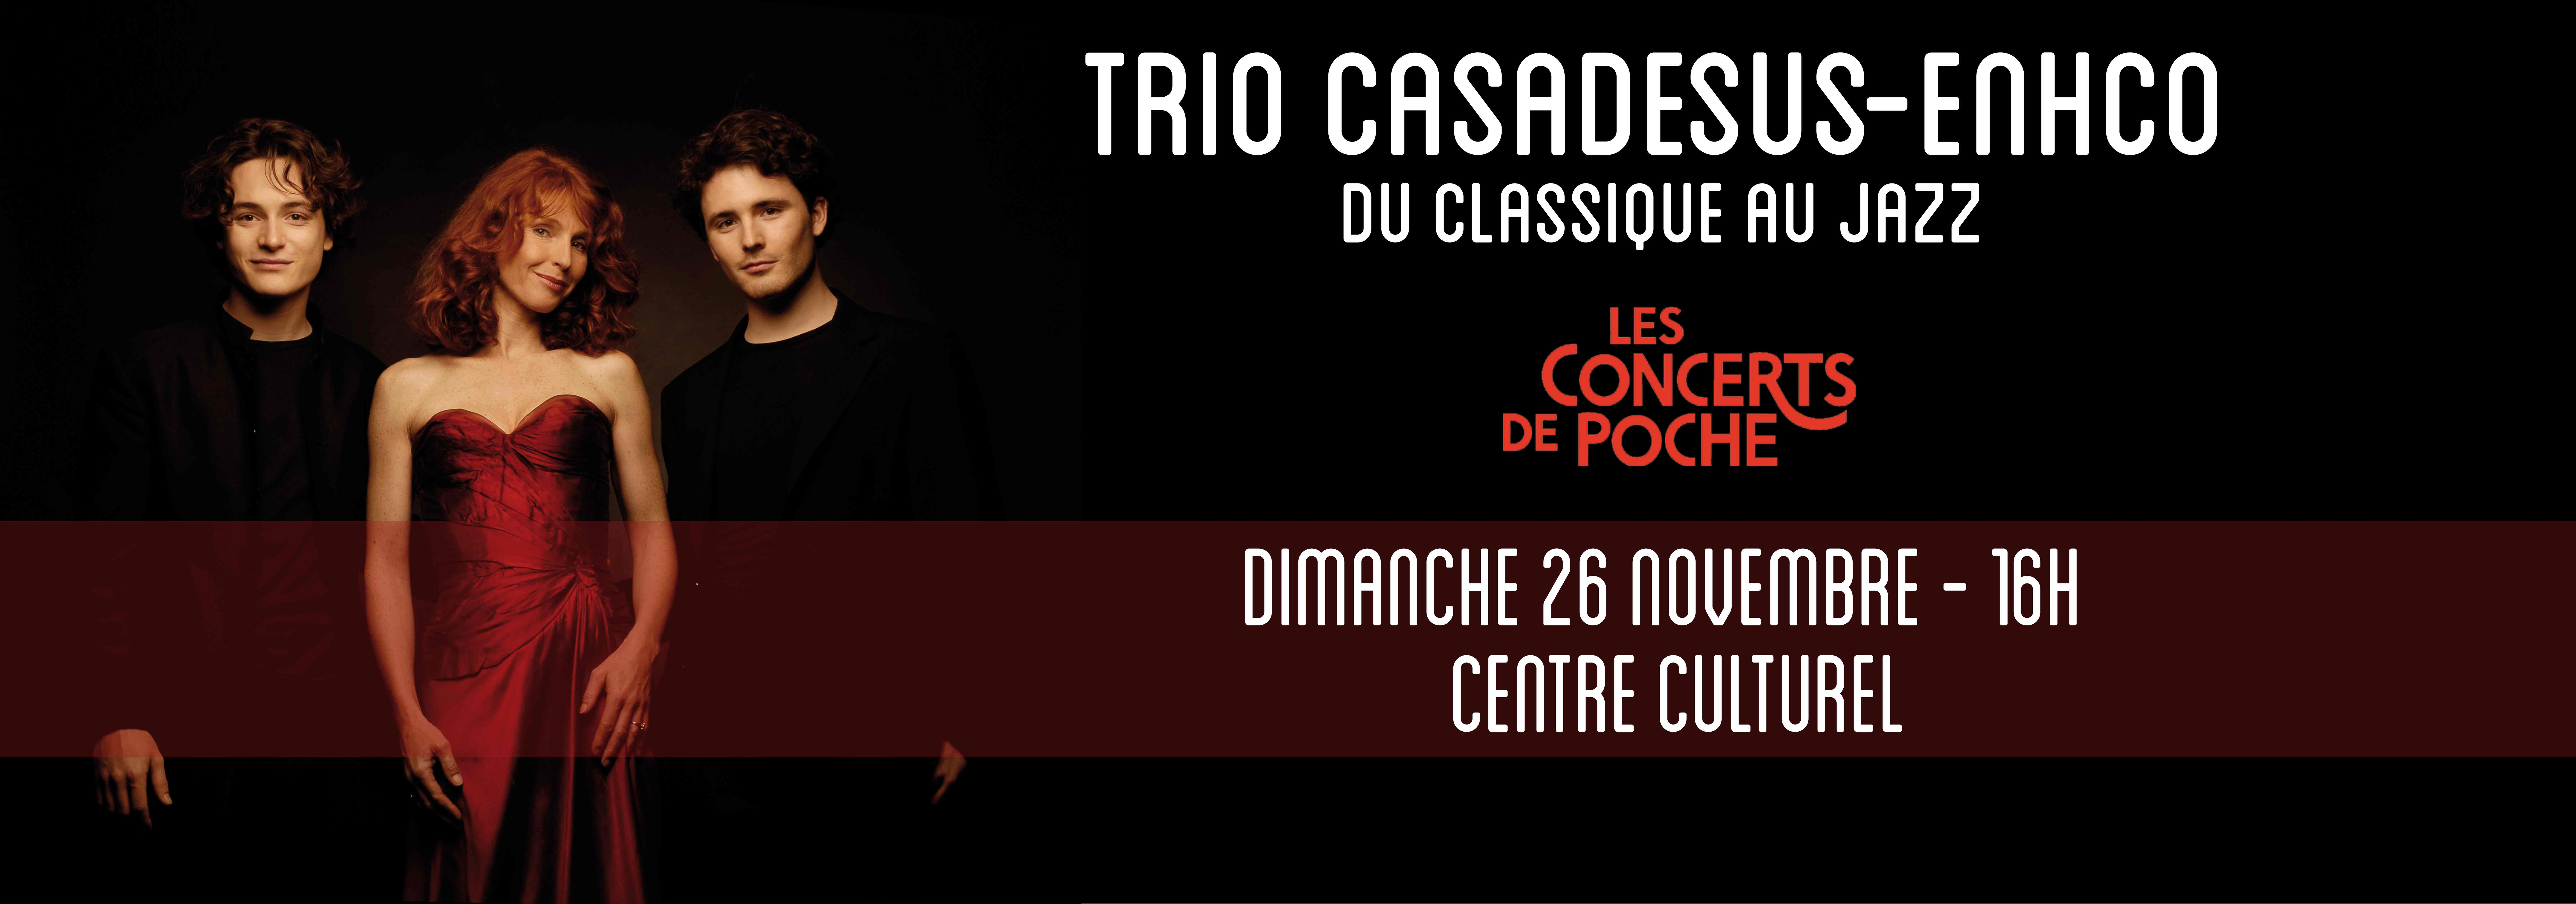 Trio Casadesus-Enhco : du classique au jazz !